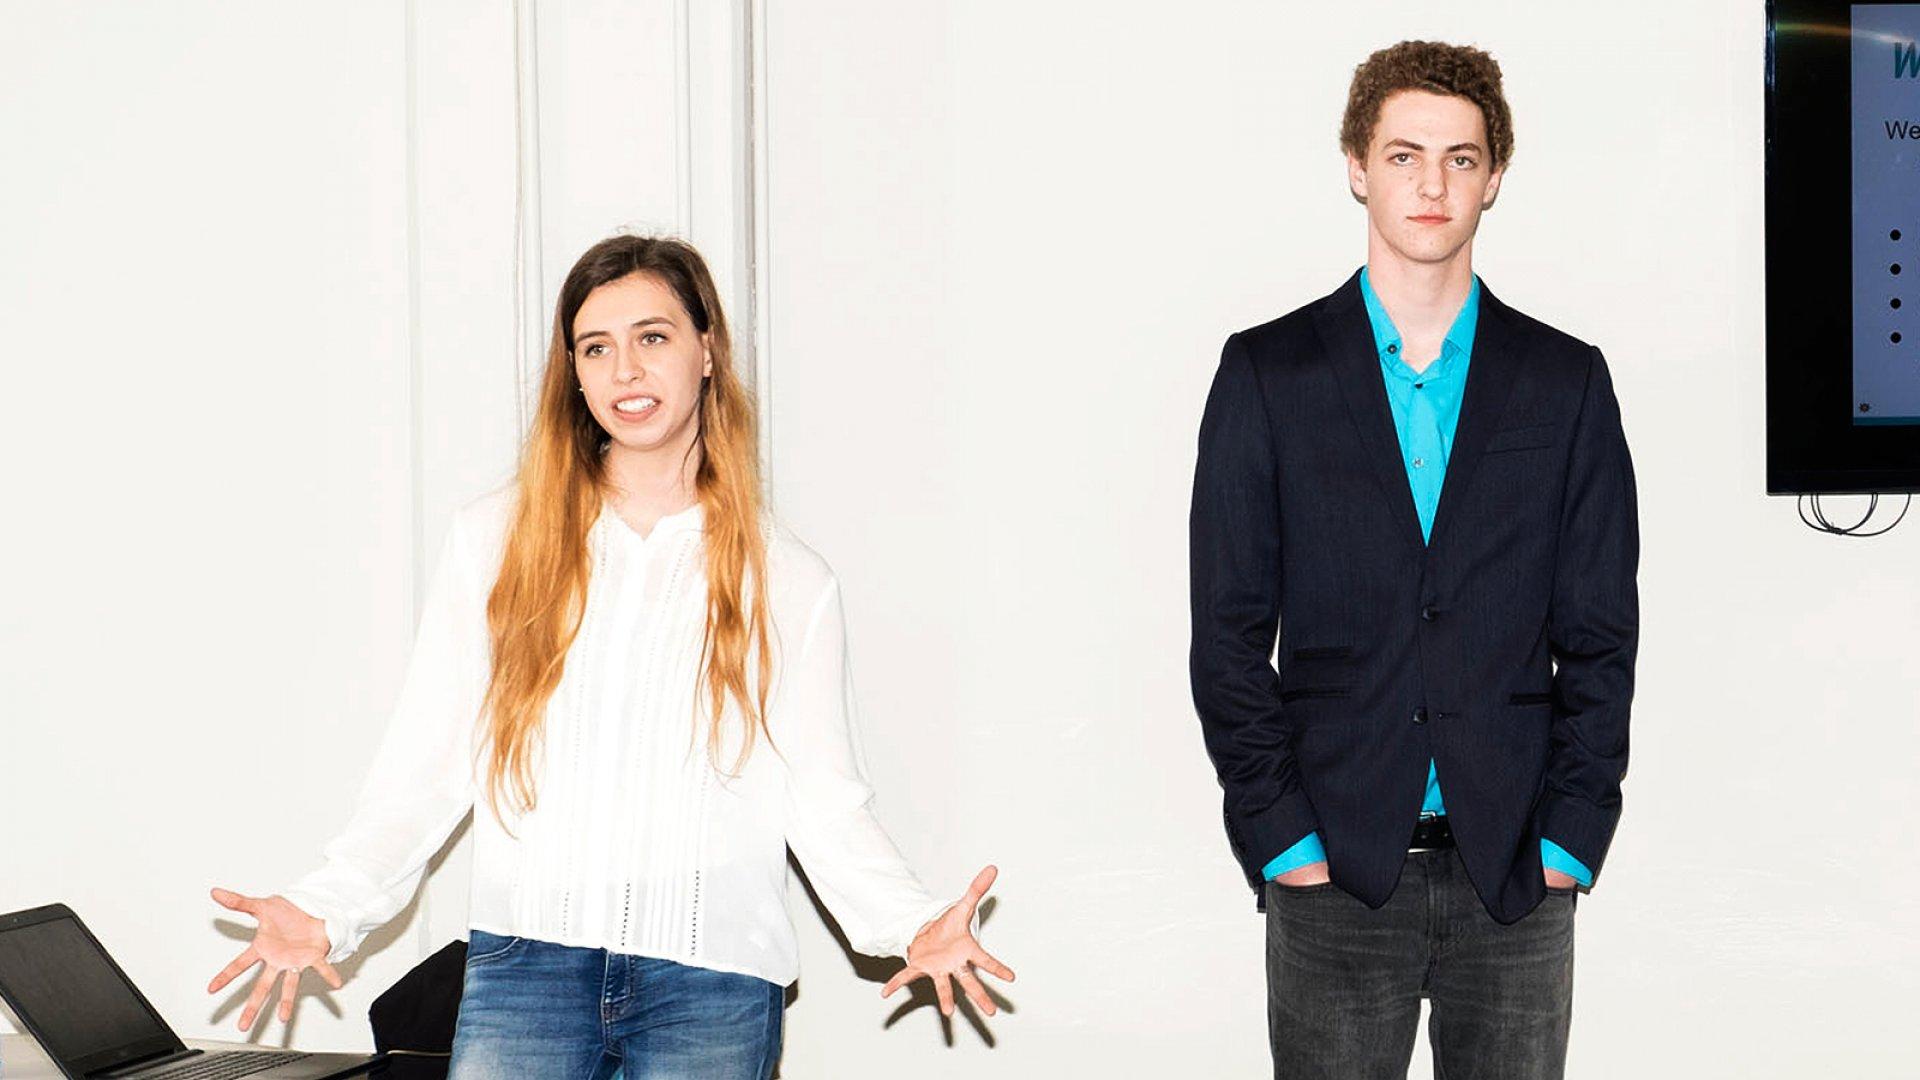 At Austin's David Crockett High School, juniors in its Student Inc. entrepreneurship program pitch their startups to investors as part of an incubator class.